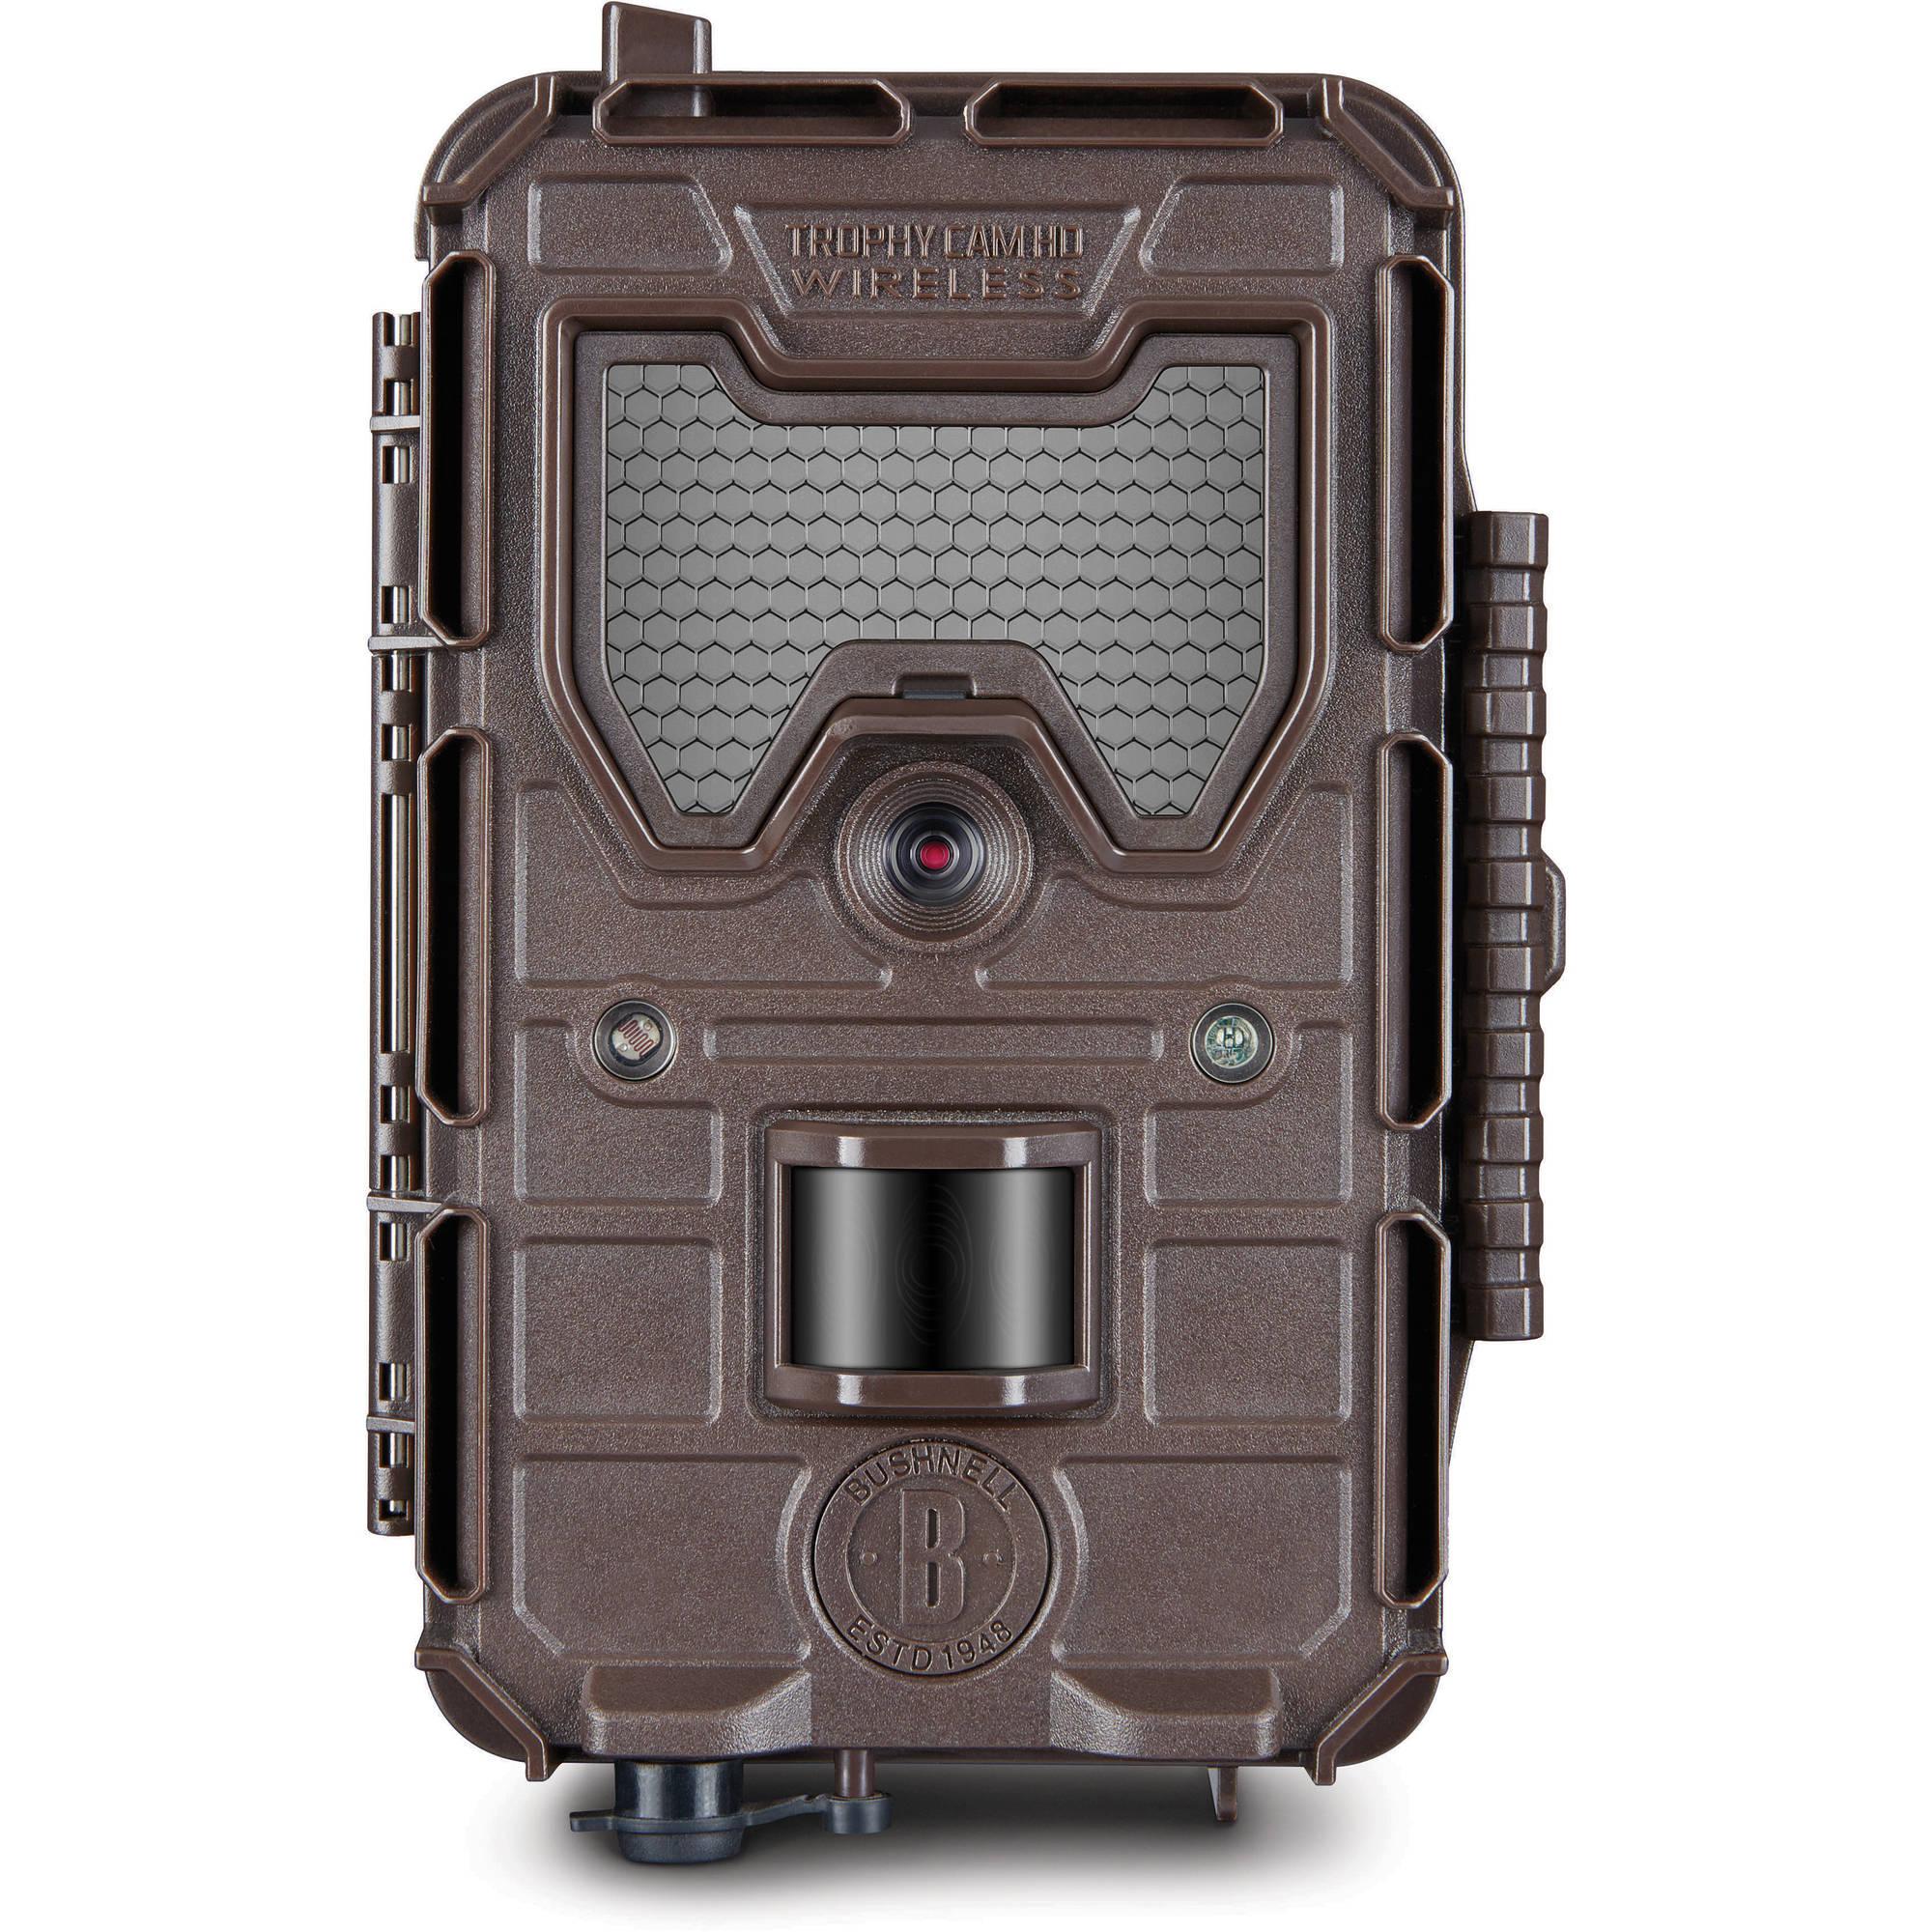 Bushnell Trophy Cam HD Aggressor, Wireless, 14MP by Bushnell